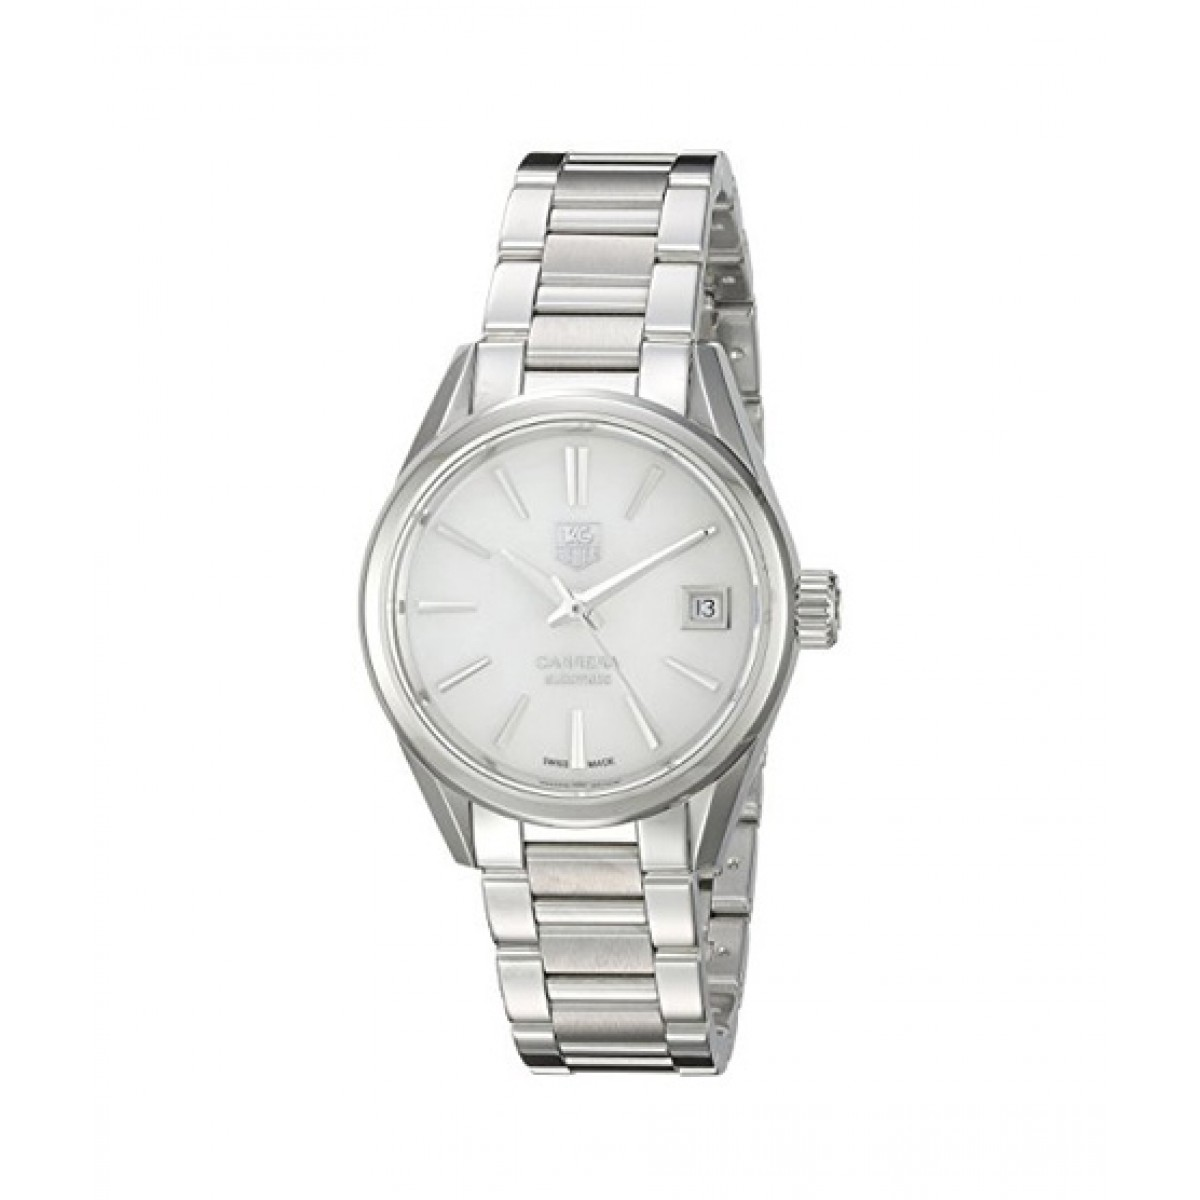 8bfd5b59fb4f TAG Heuer Carrera Women s Watch Price in Pakistan